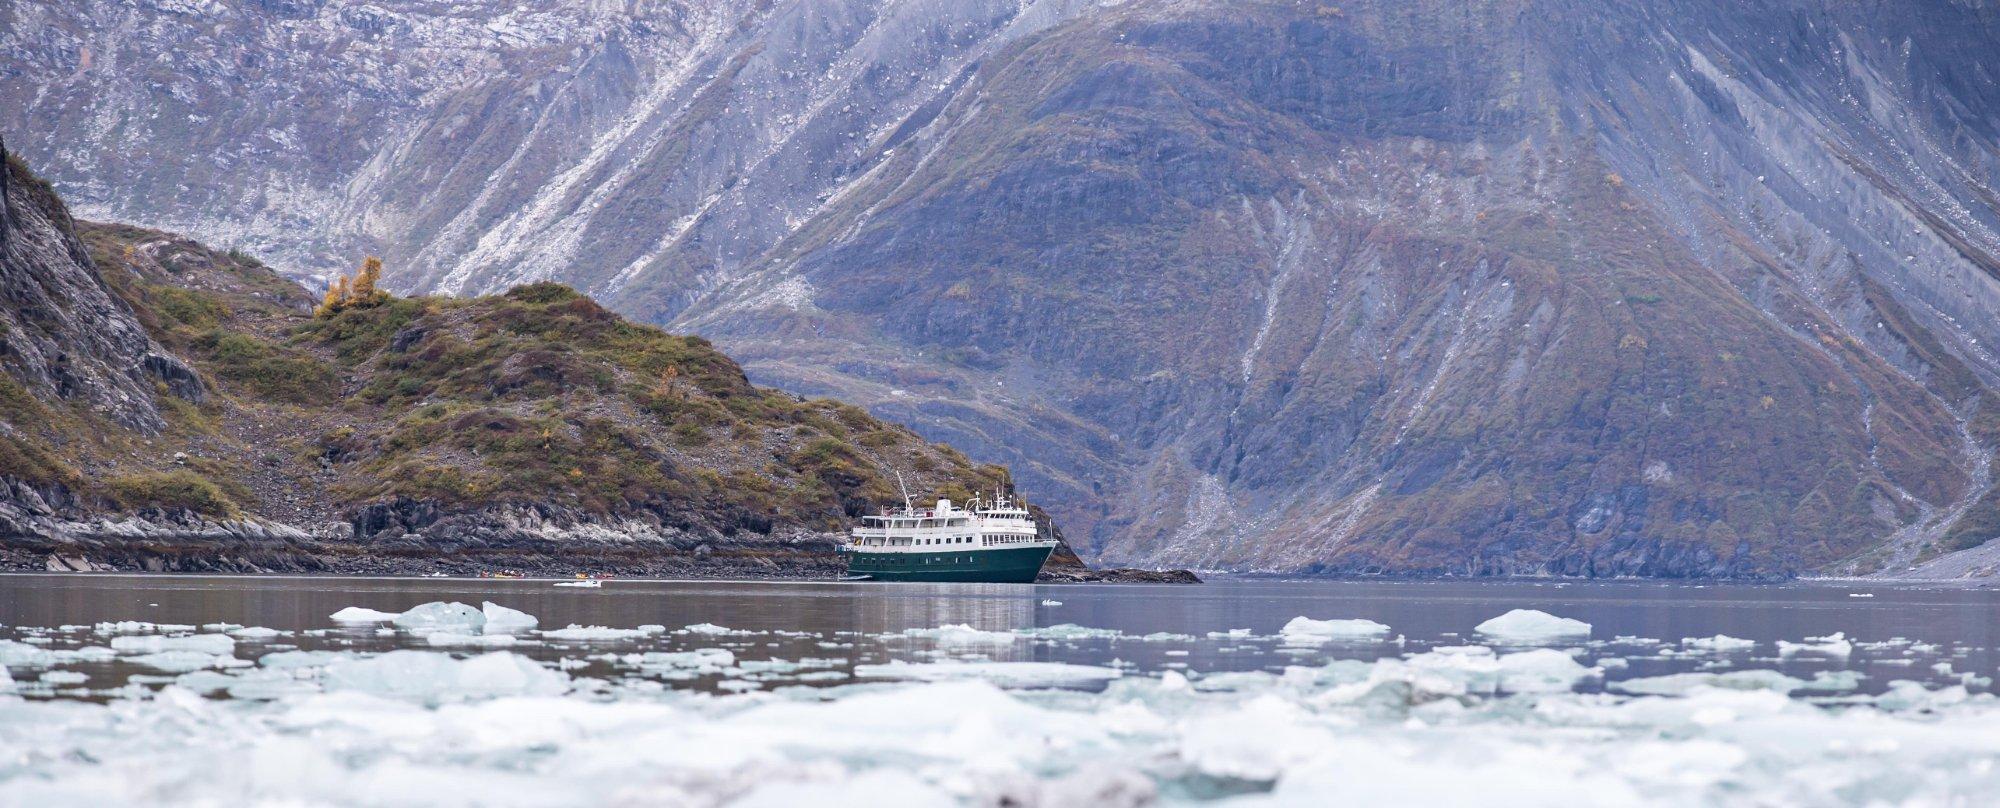 Wilderness Explorer Glacier Bay